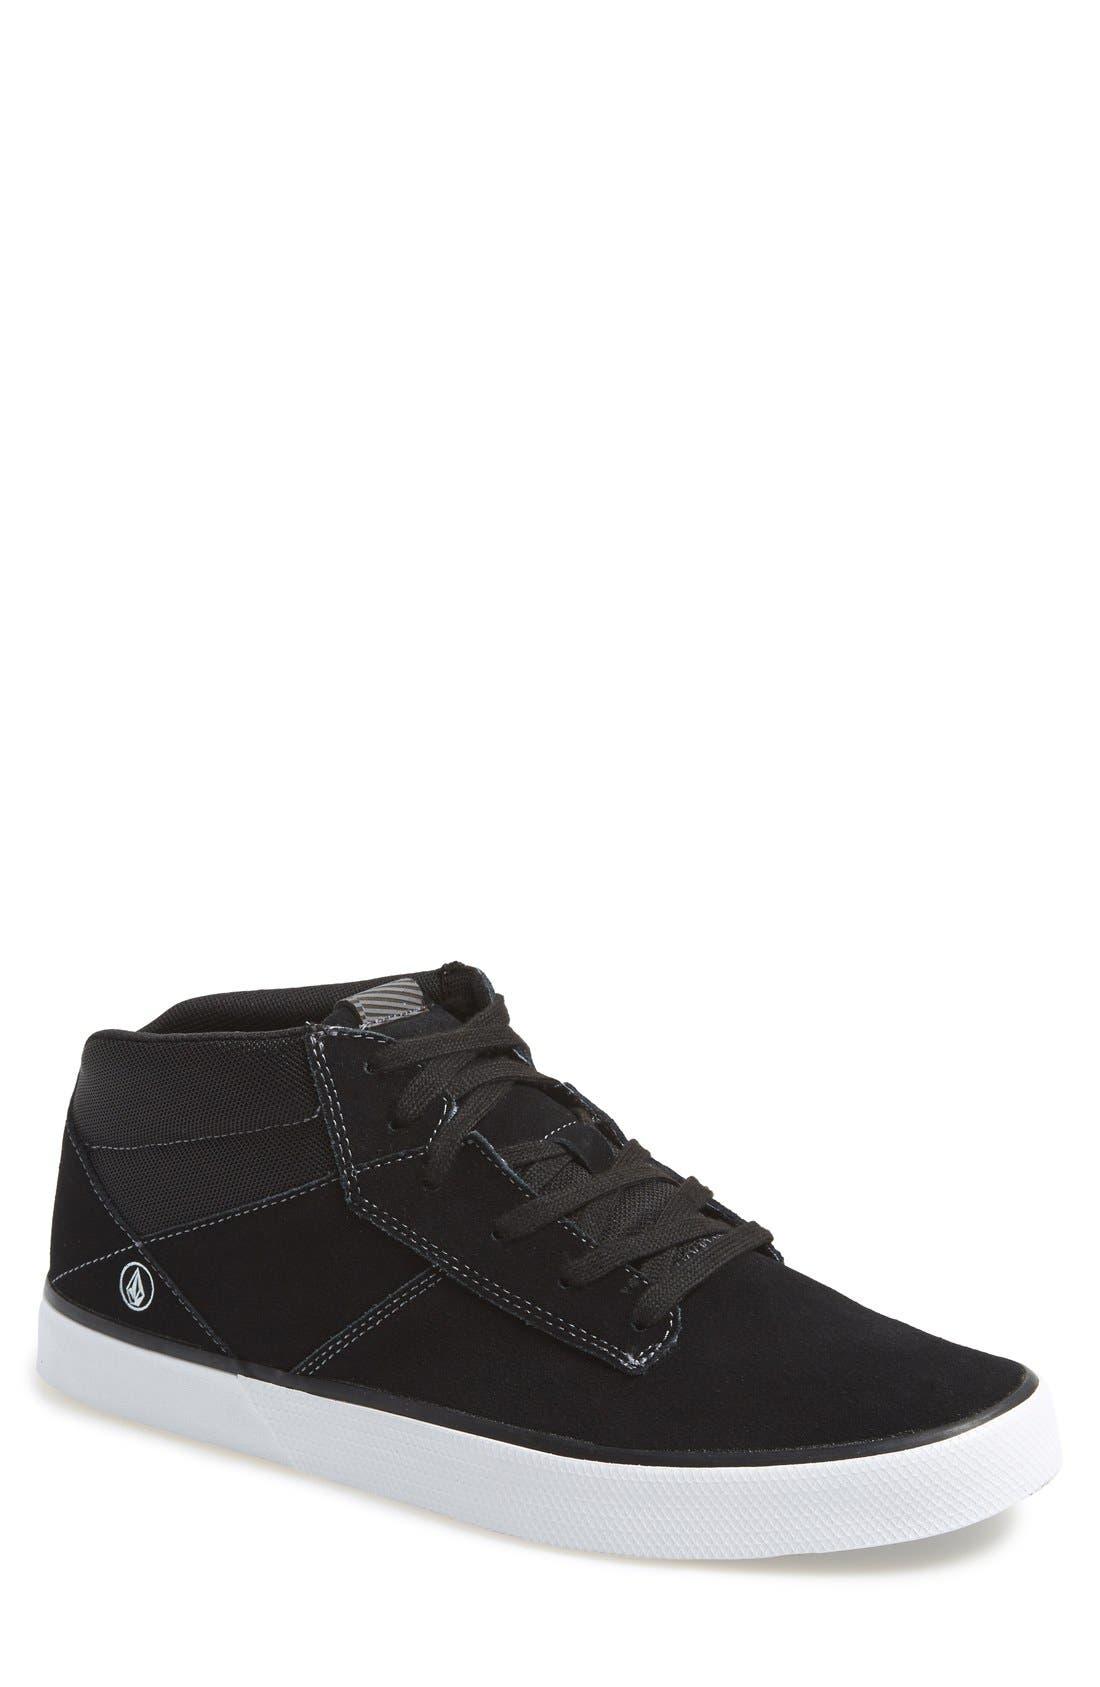 'Grimm Mid 2' Sneaker, Main, color, 018